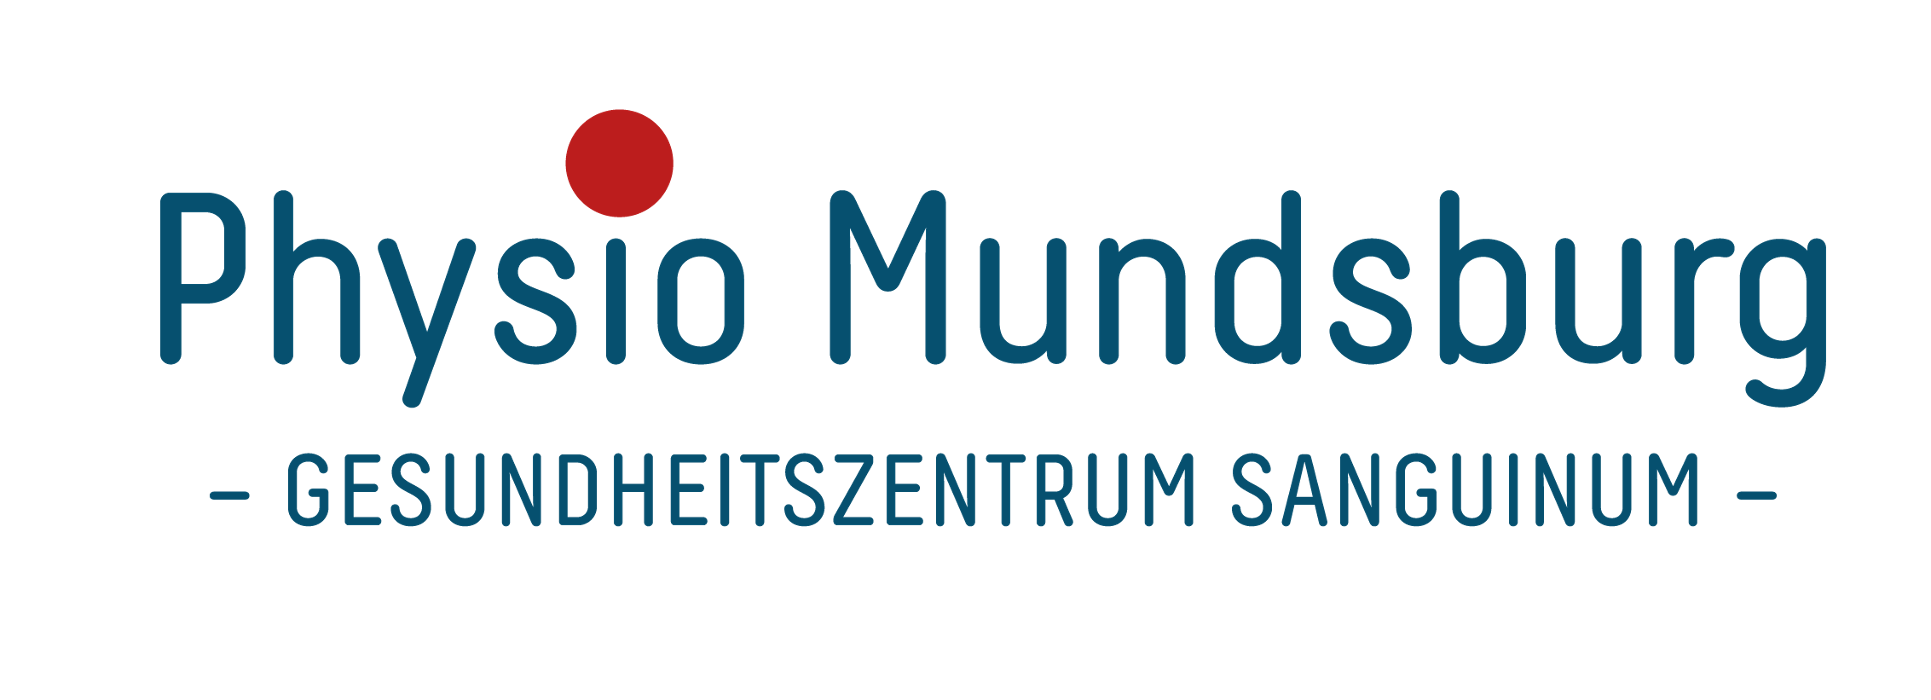 Bild zu Physio Mundsburg in Hamburg